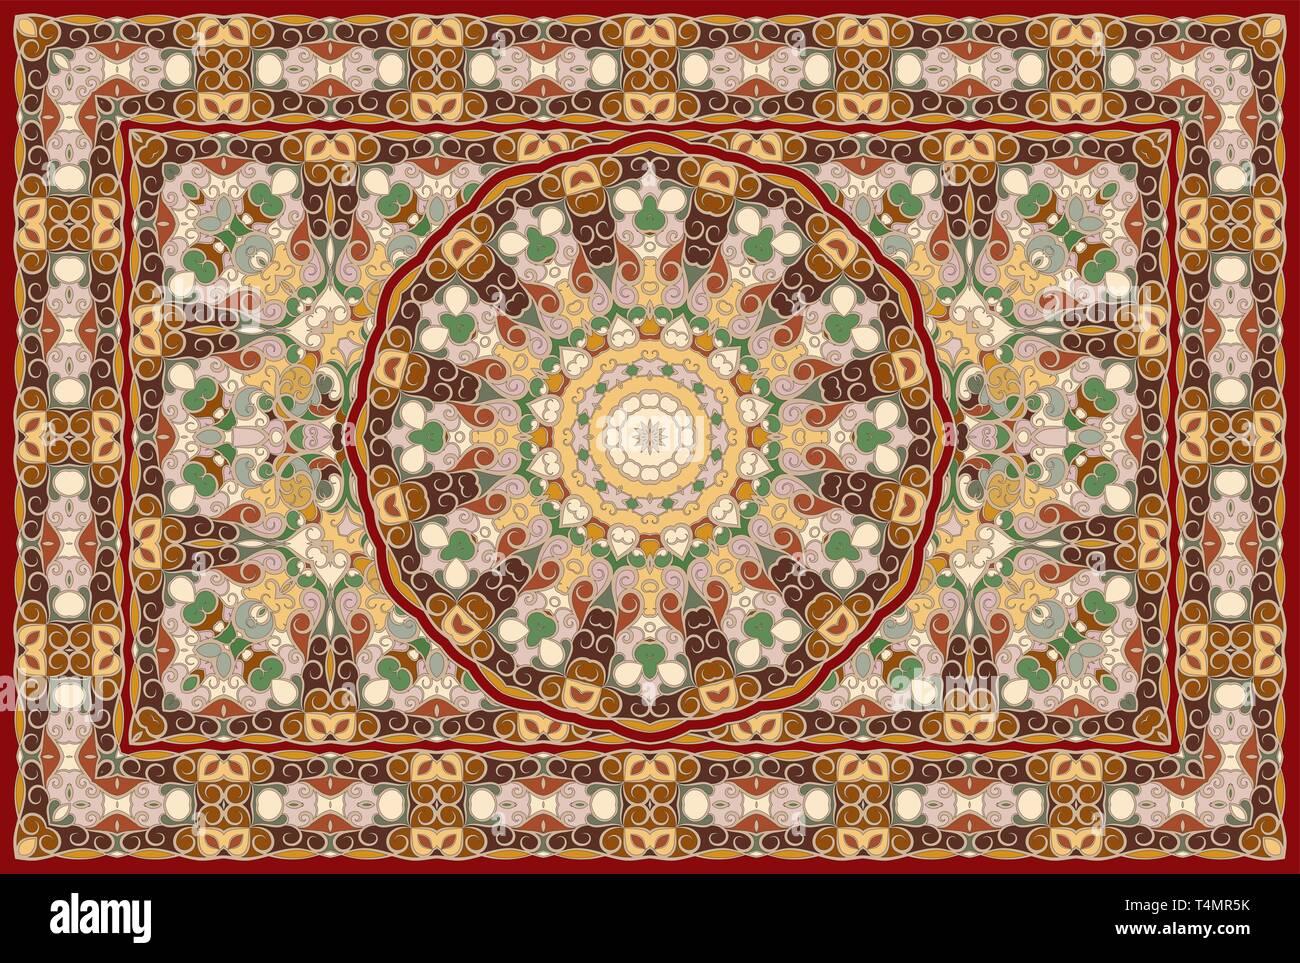 Rich Arabic Ornament For Carpet Colored Persian Rug Stock